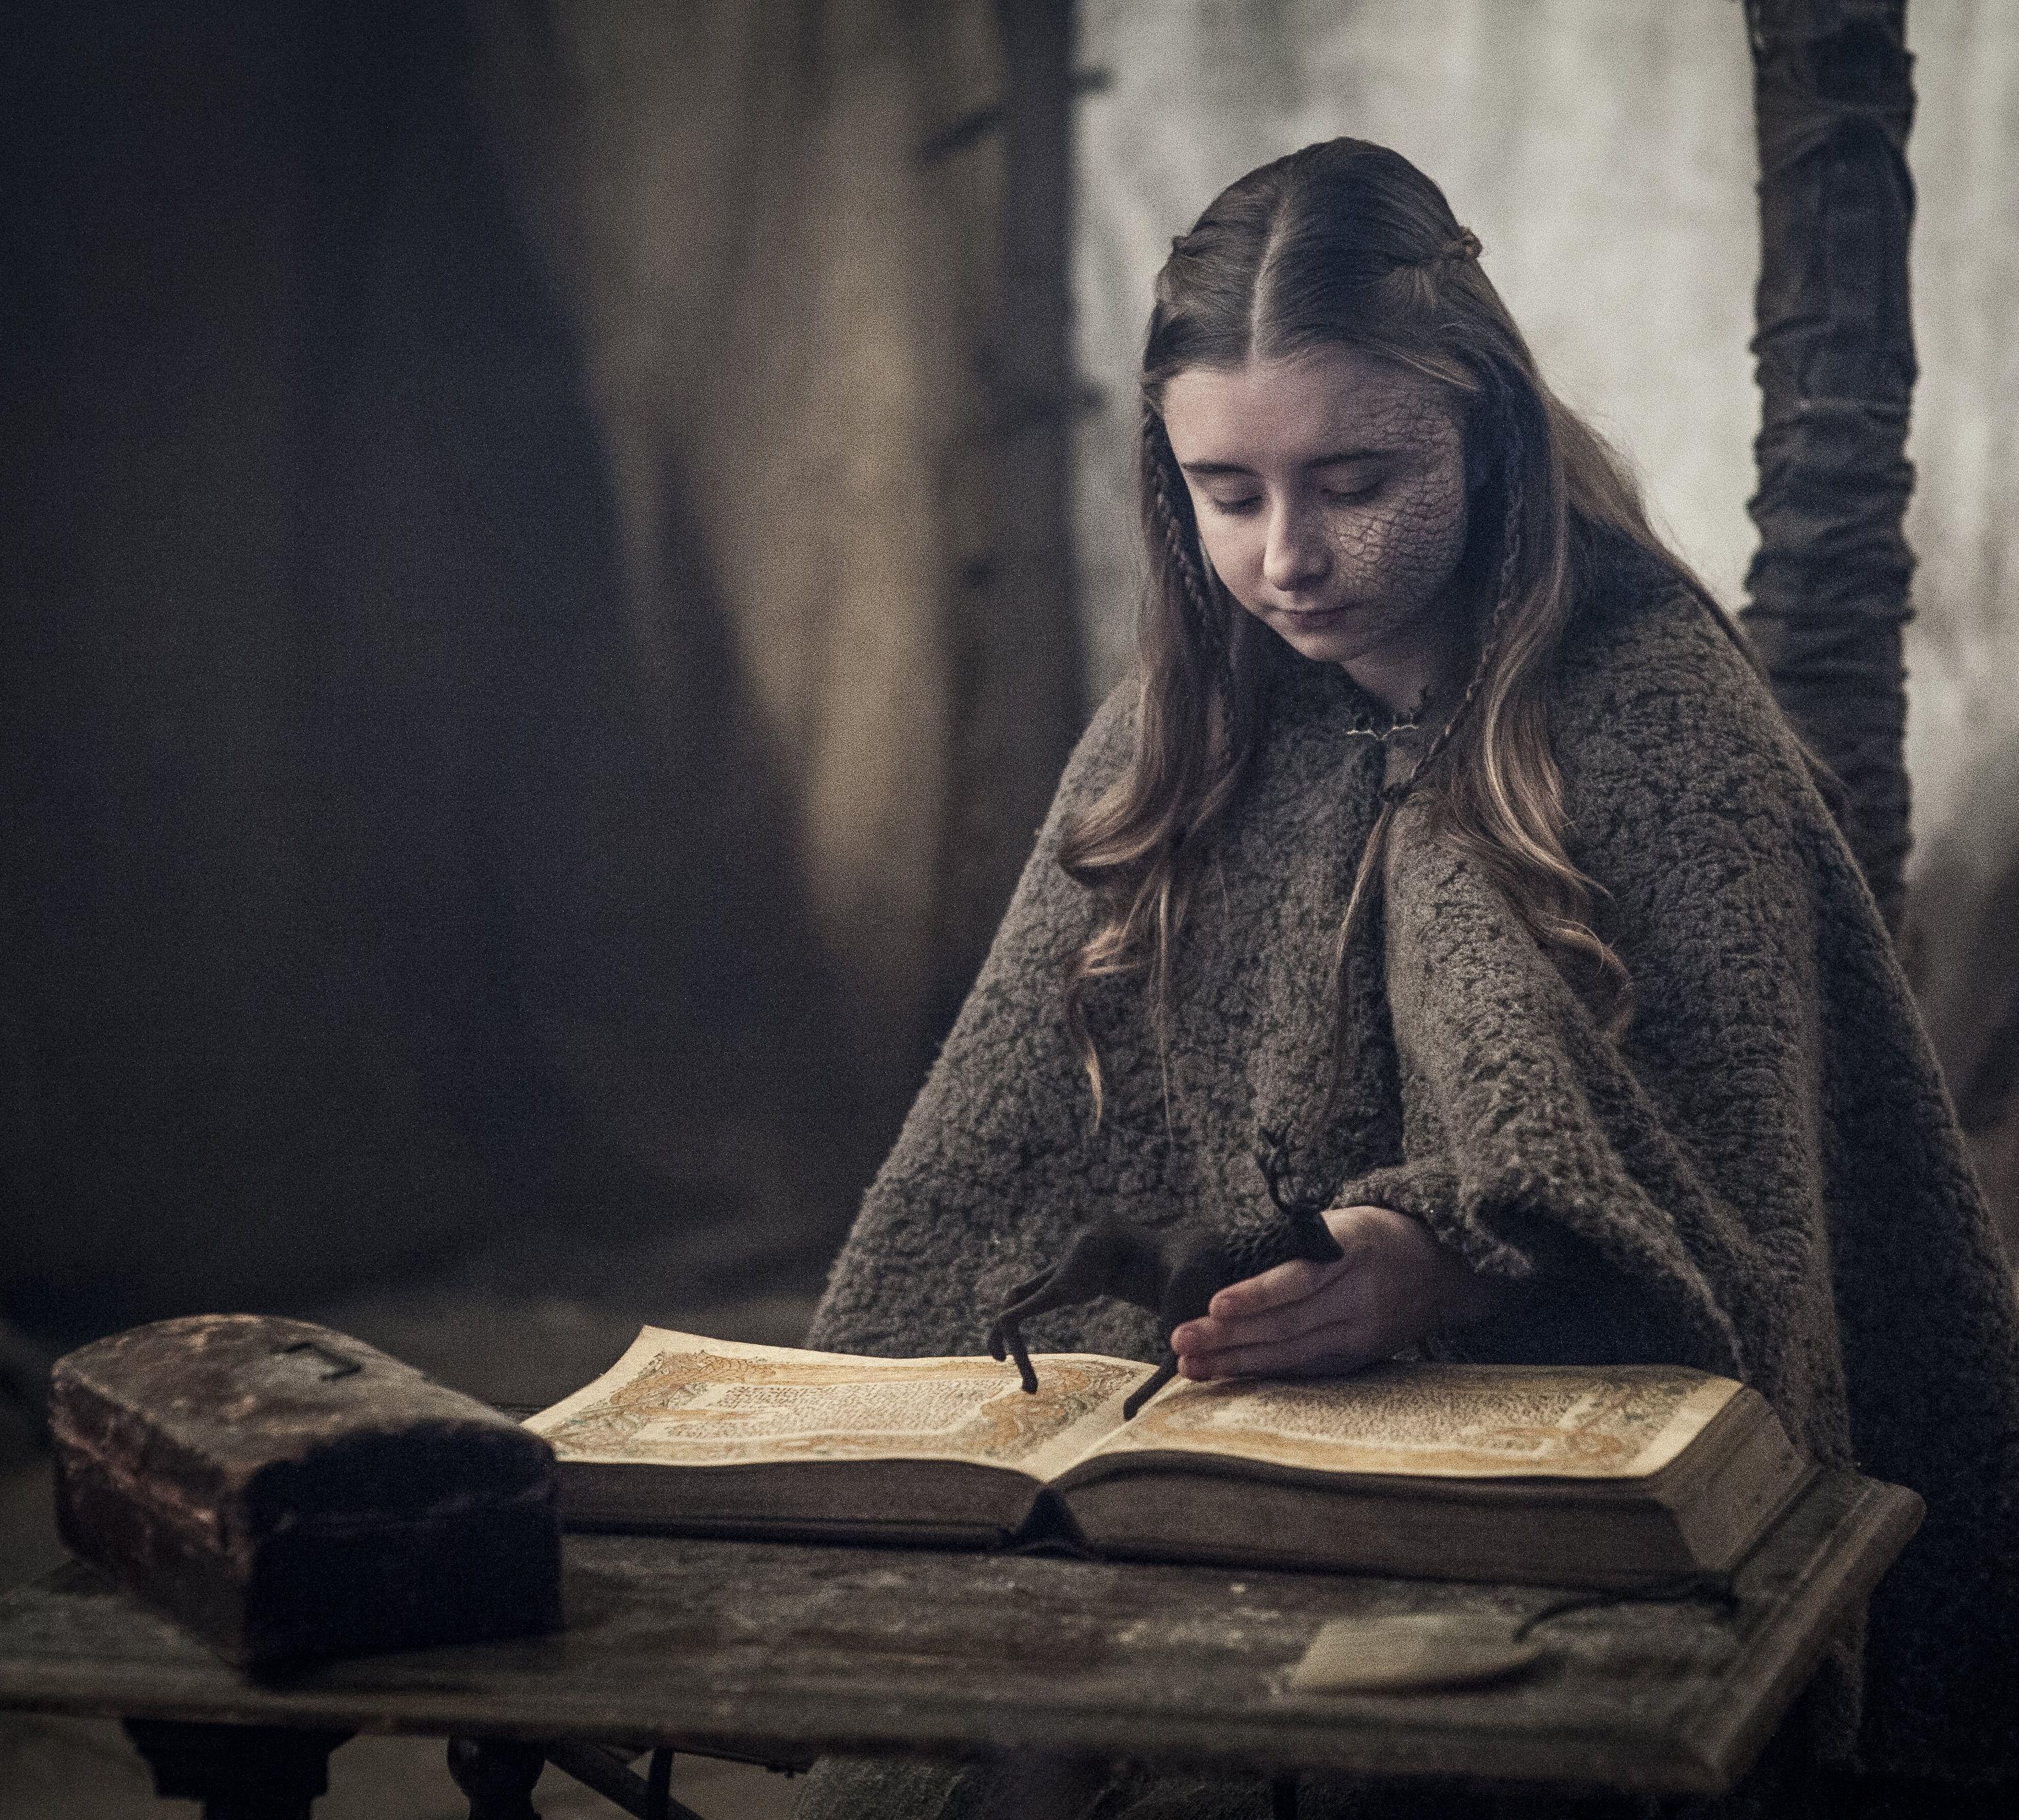 Game Of Thrones Season 5 Episode 9 (Shireen Baratheon